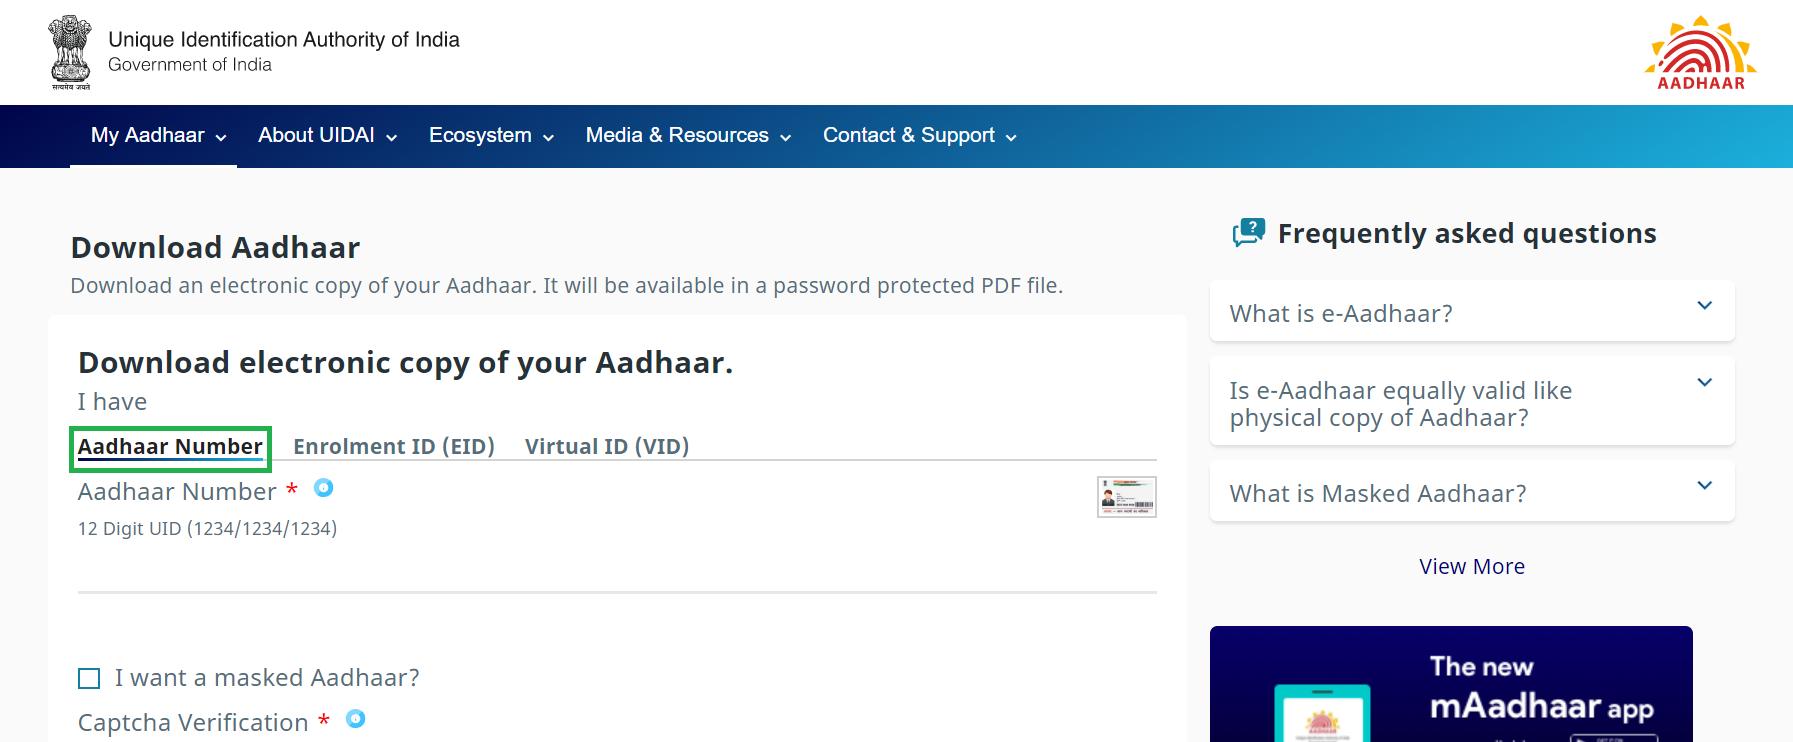 4 Ways to Download Your Aadhar Card (Online) - Groww